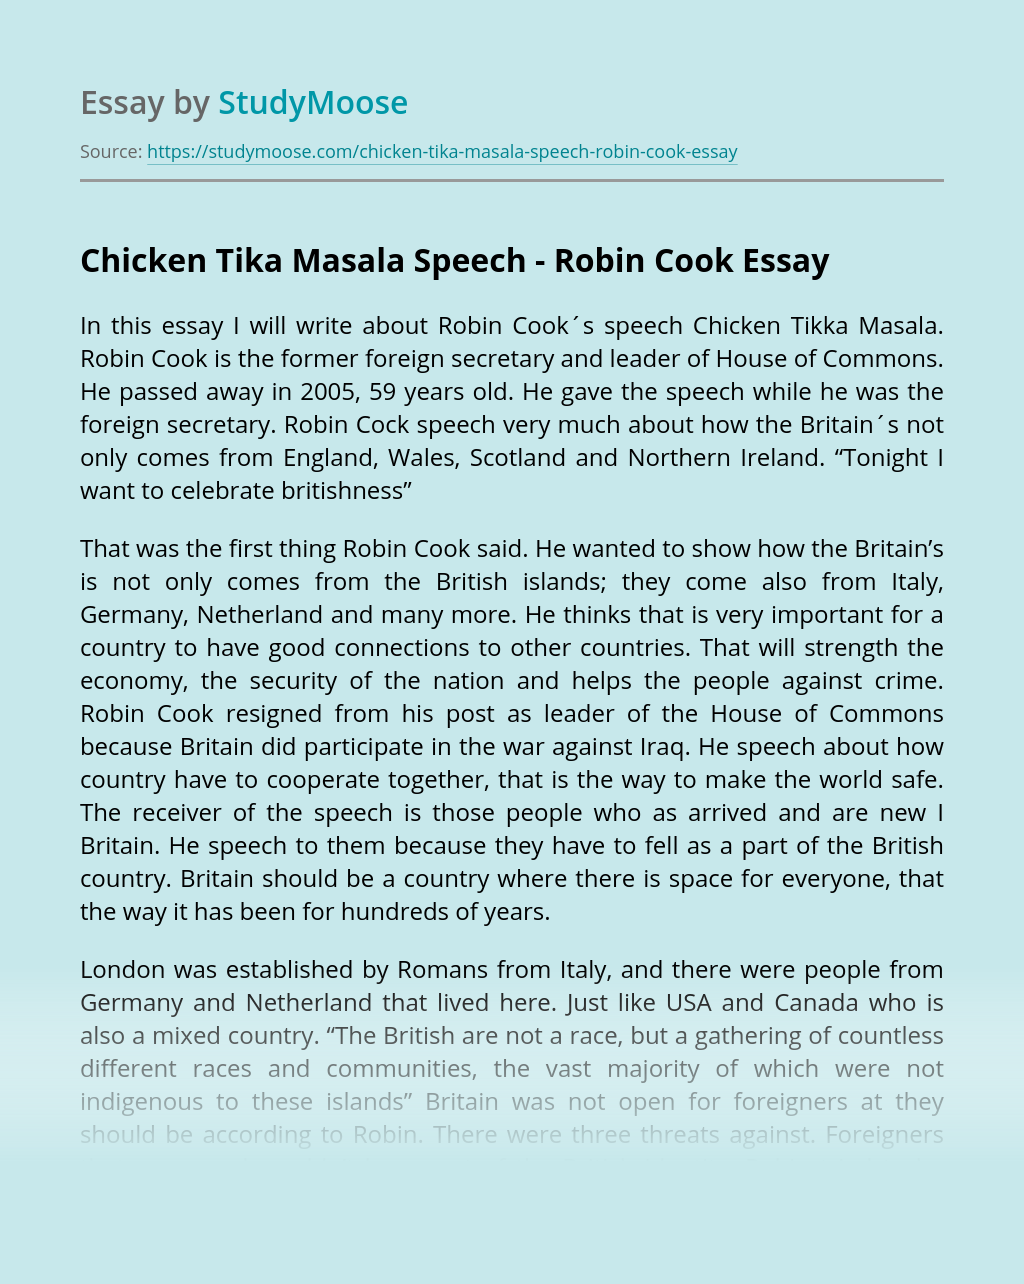 Chicken Tika Masala Speech - Robin Cook